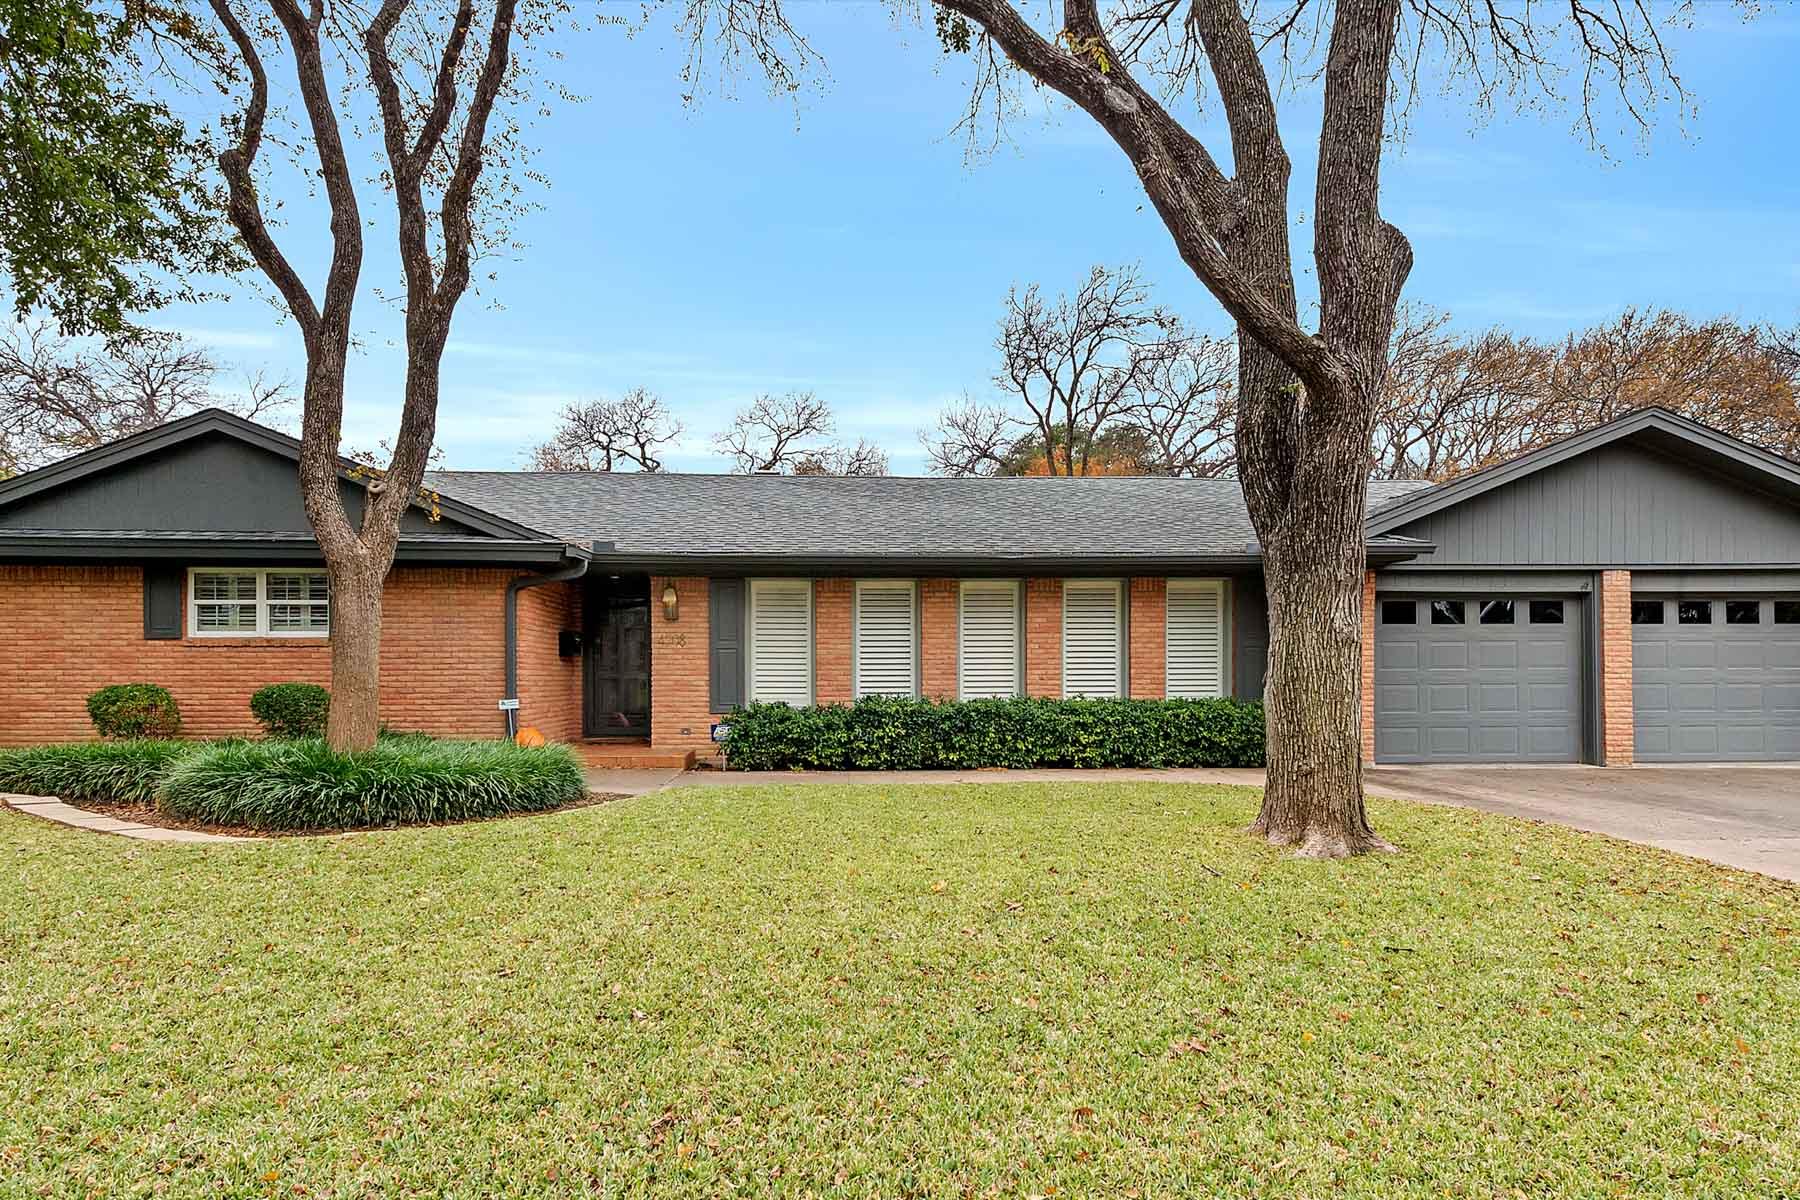 Villa per Vendita alle ore 4308 Inwood Road, Fort Worth 4308 Inwood Rd Fort Worth, Texas, 76109 Stati Uniti